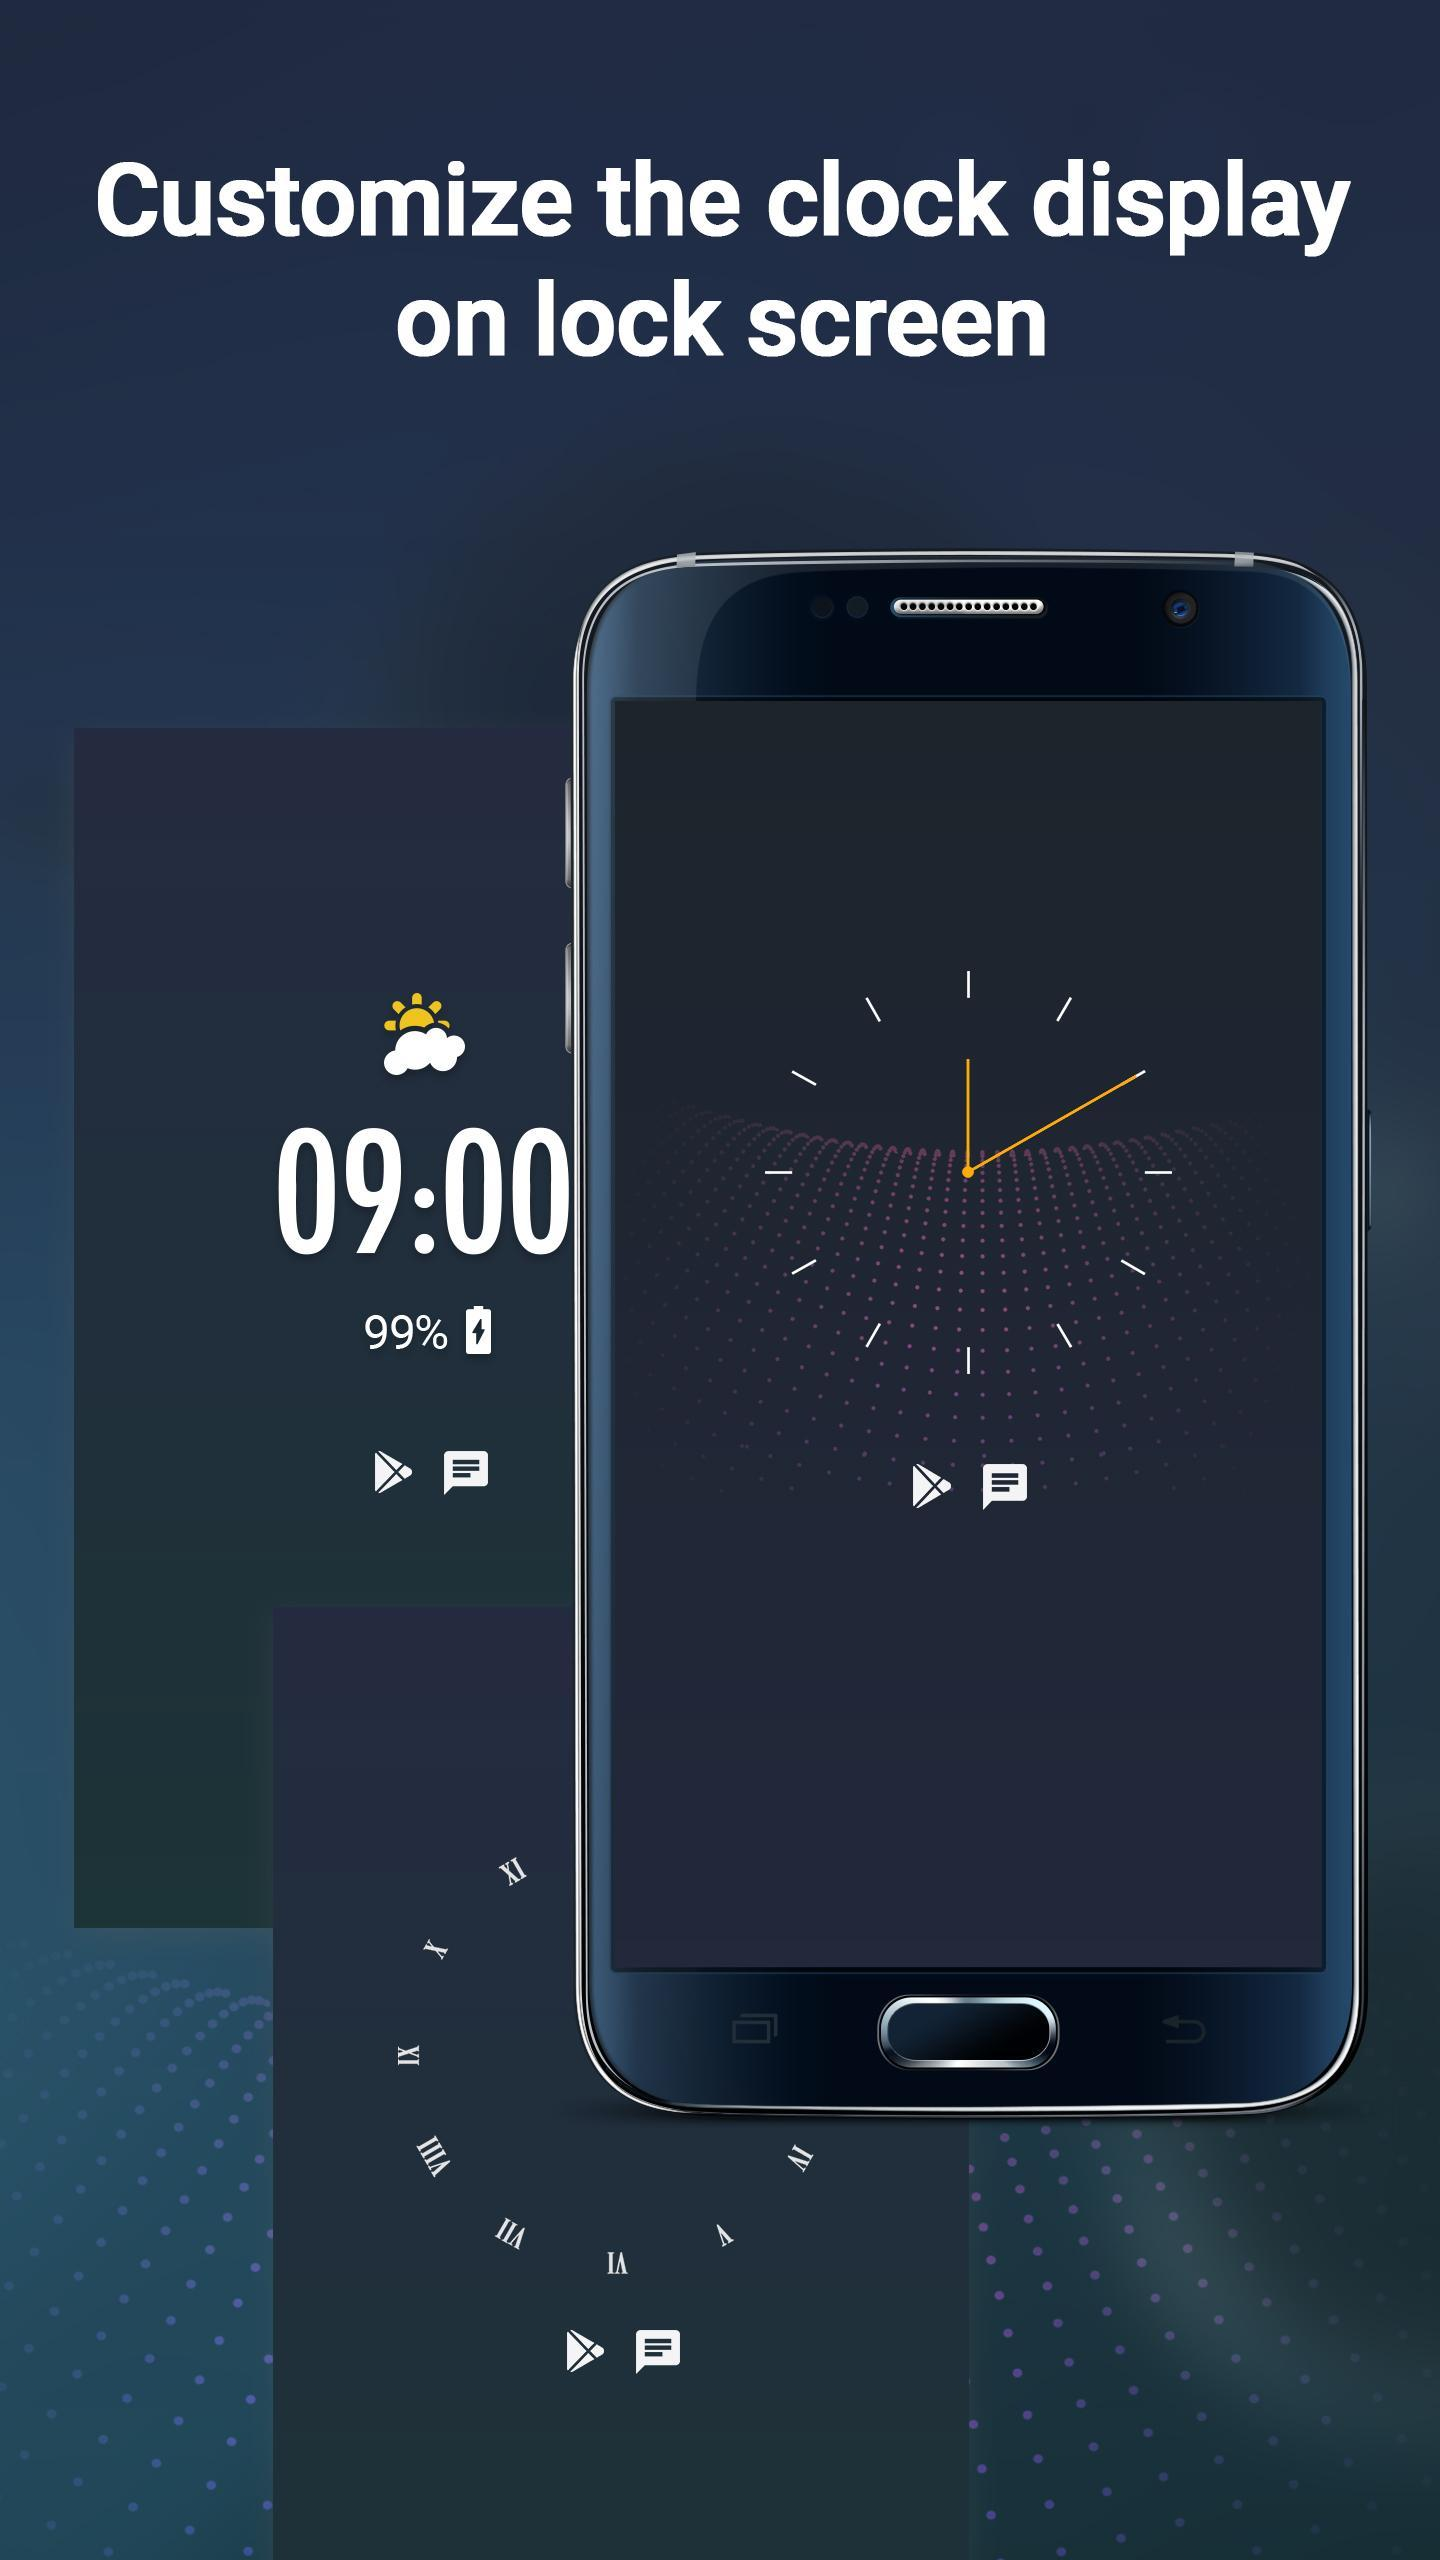 Display Clock On Lockscreen, Clock On Sleep Screen for